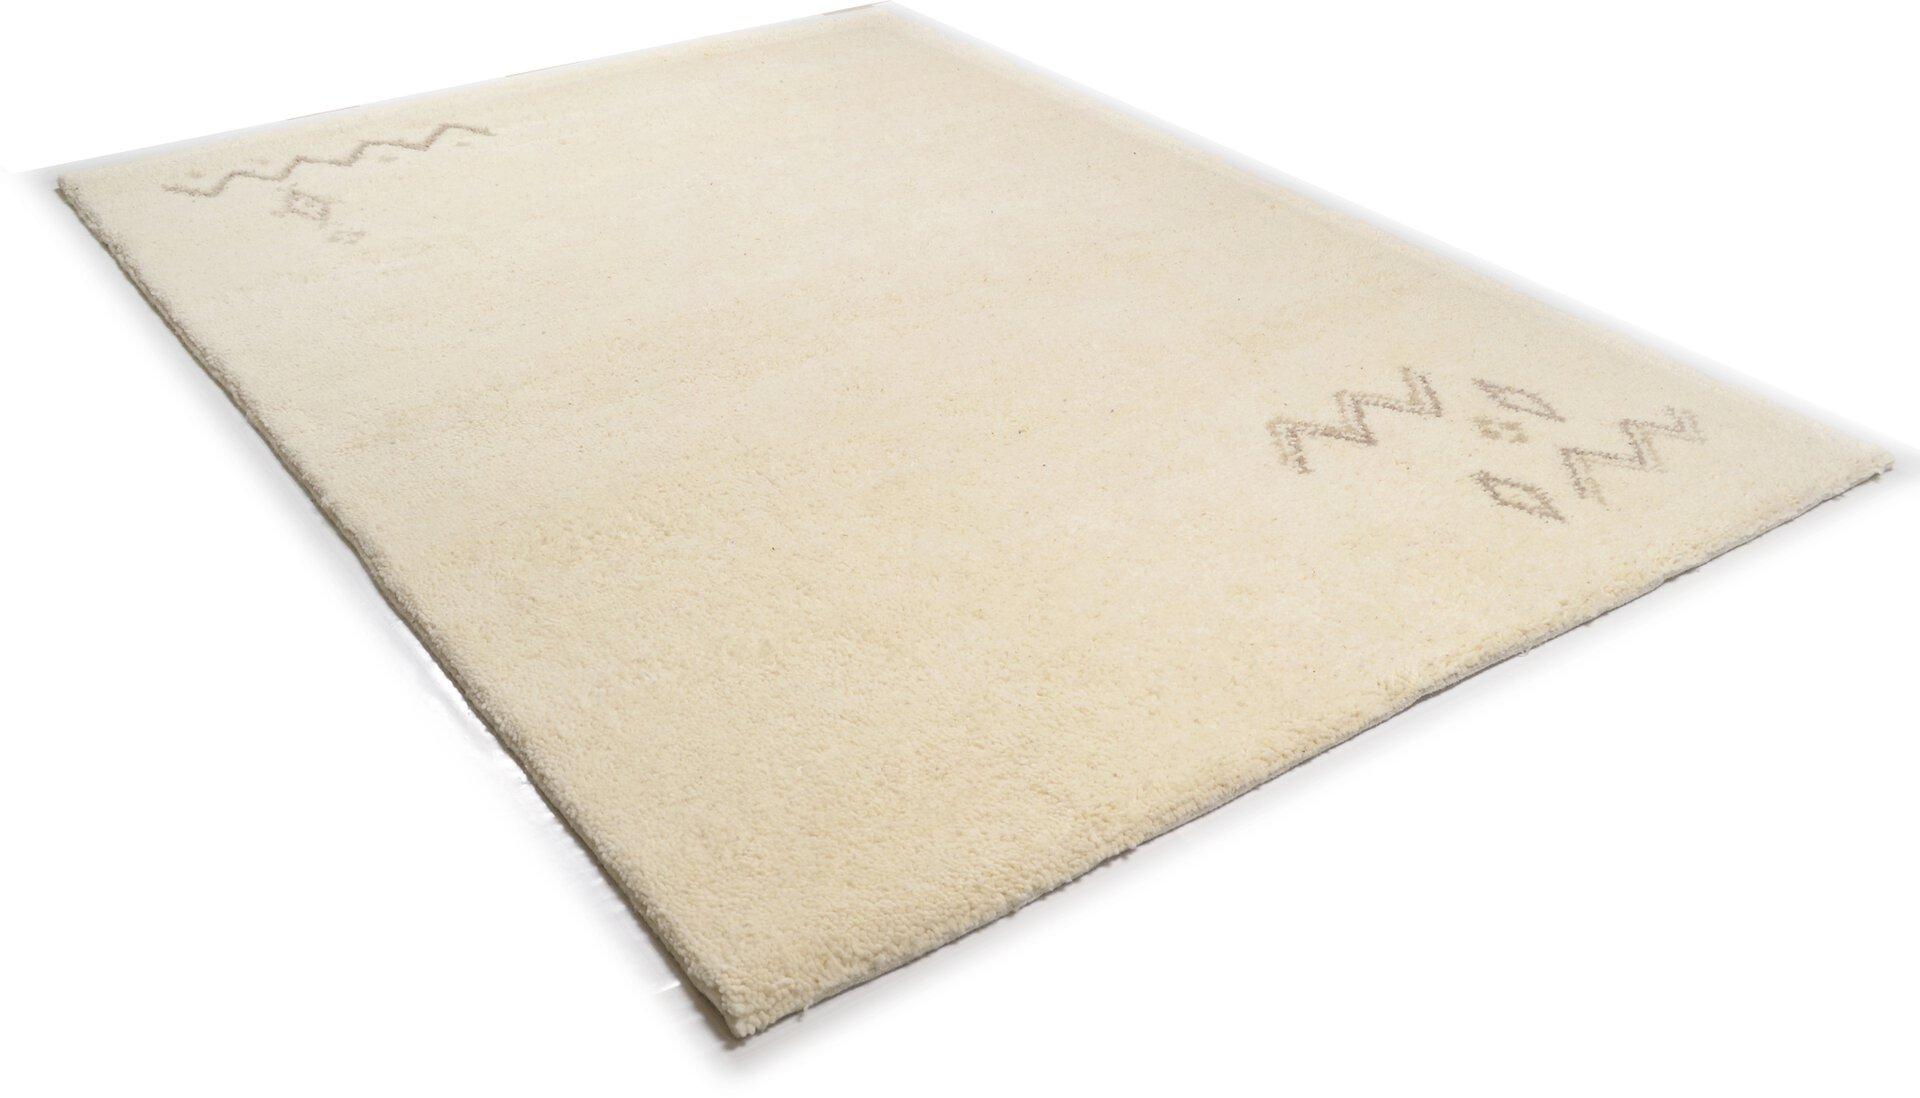 Handknüpfteppich Royal Maroc Theko Textil braun